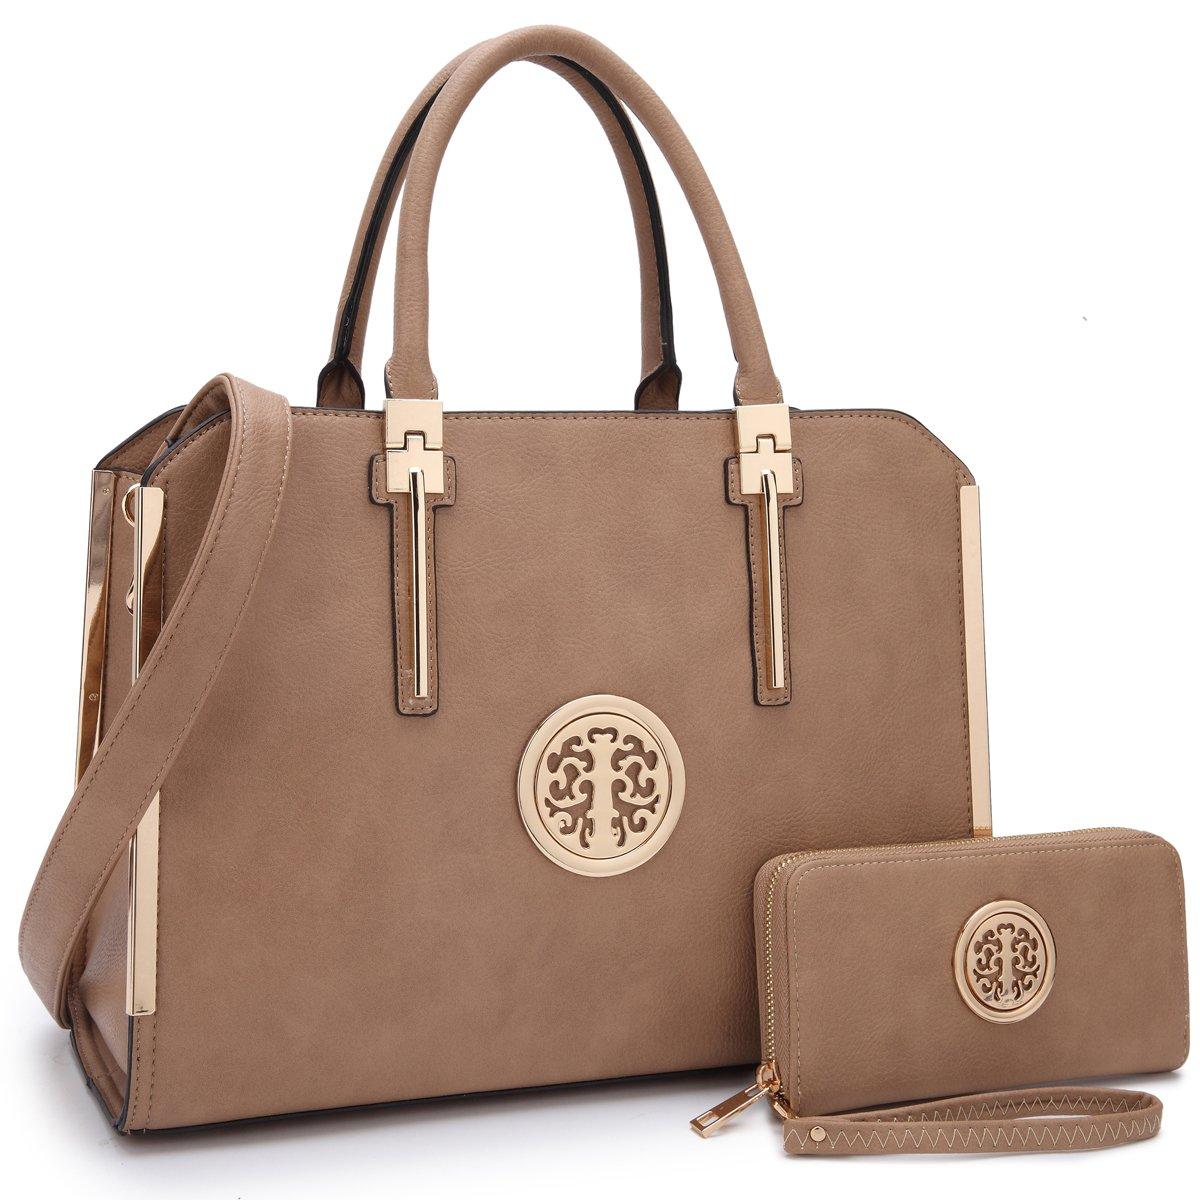 MMK Fashion Handbag for Women Classic Satchel handbag Designer Top handle purse Trending Hobo Tote bag 2 pieces(Handbag/wallet) Set (B-7555-W-Beige) by 1988 Marco M.Kelly